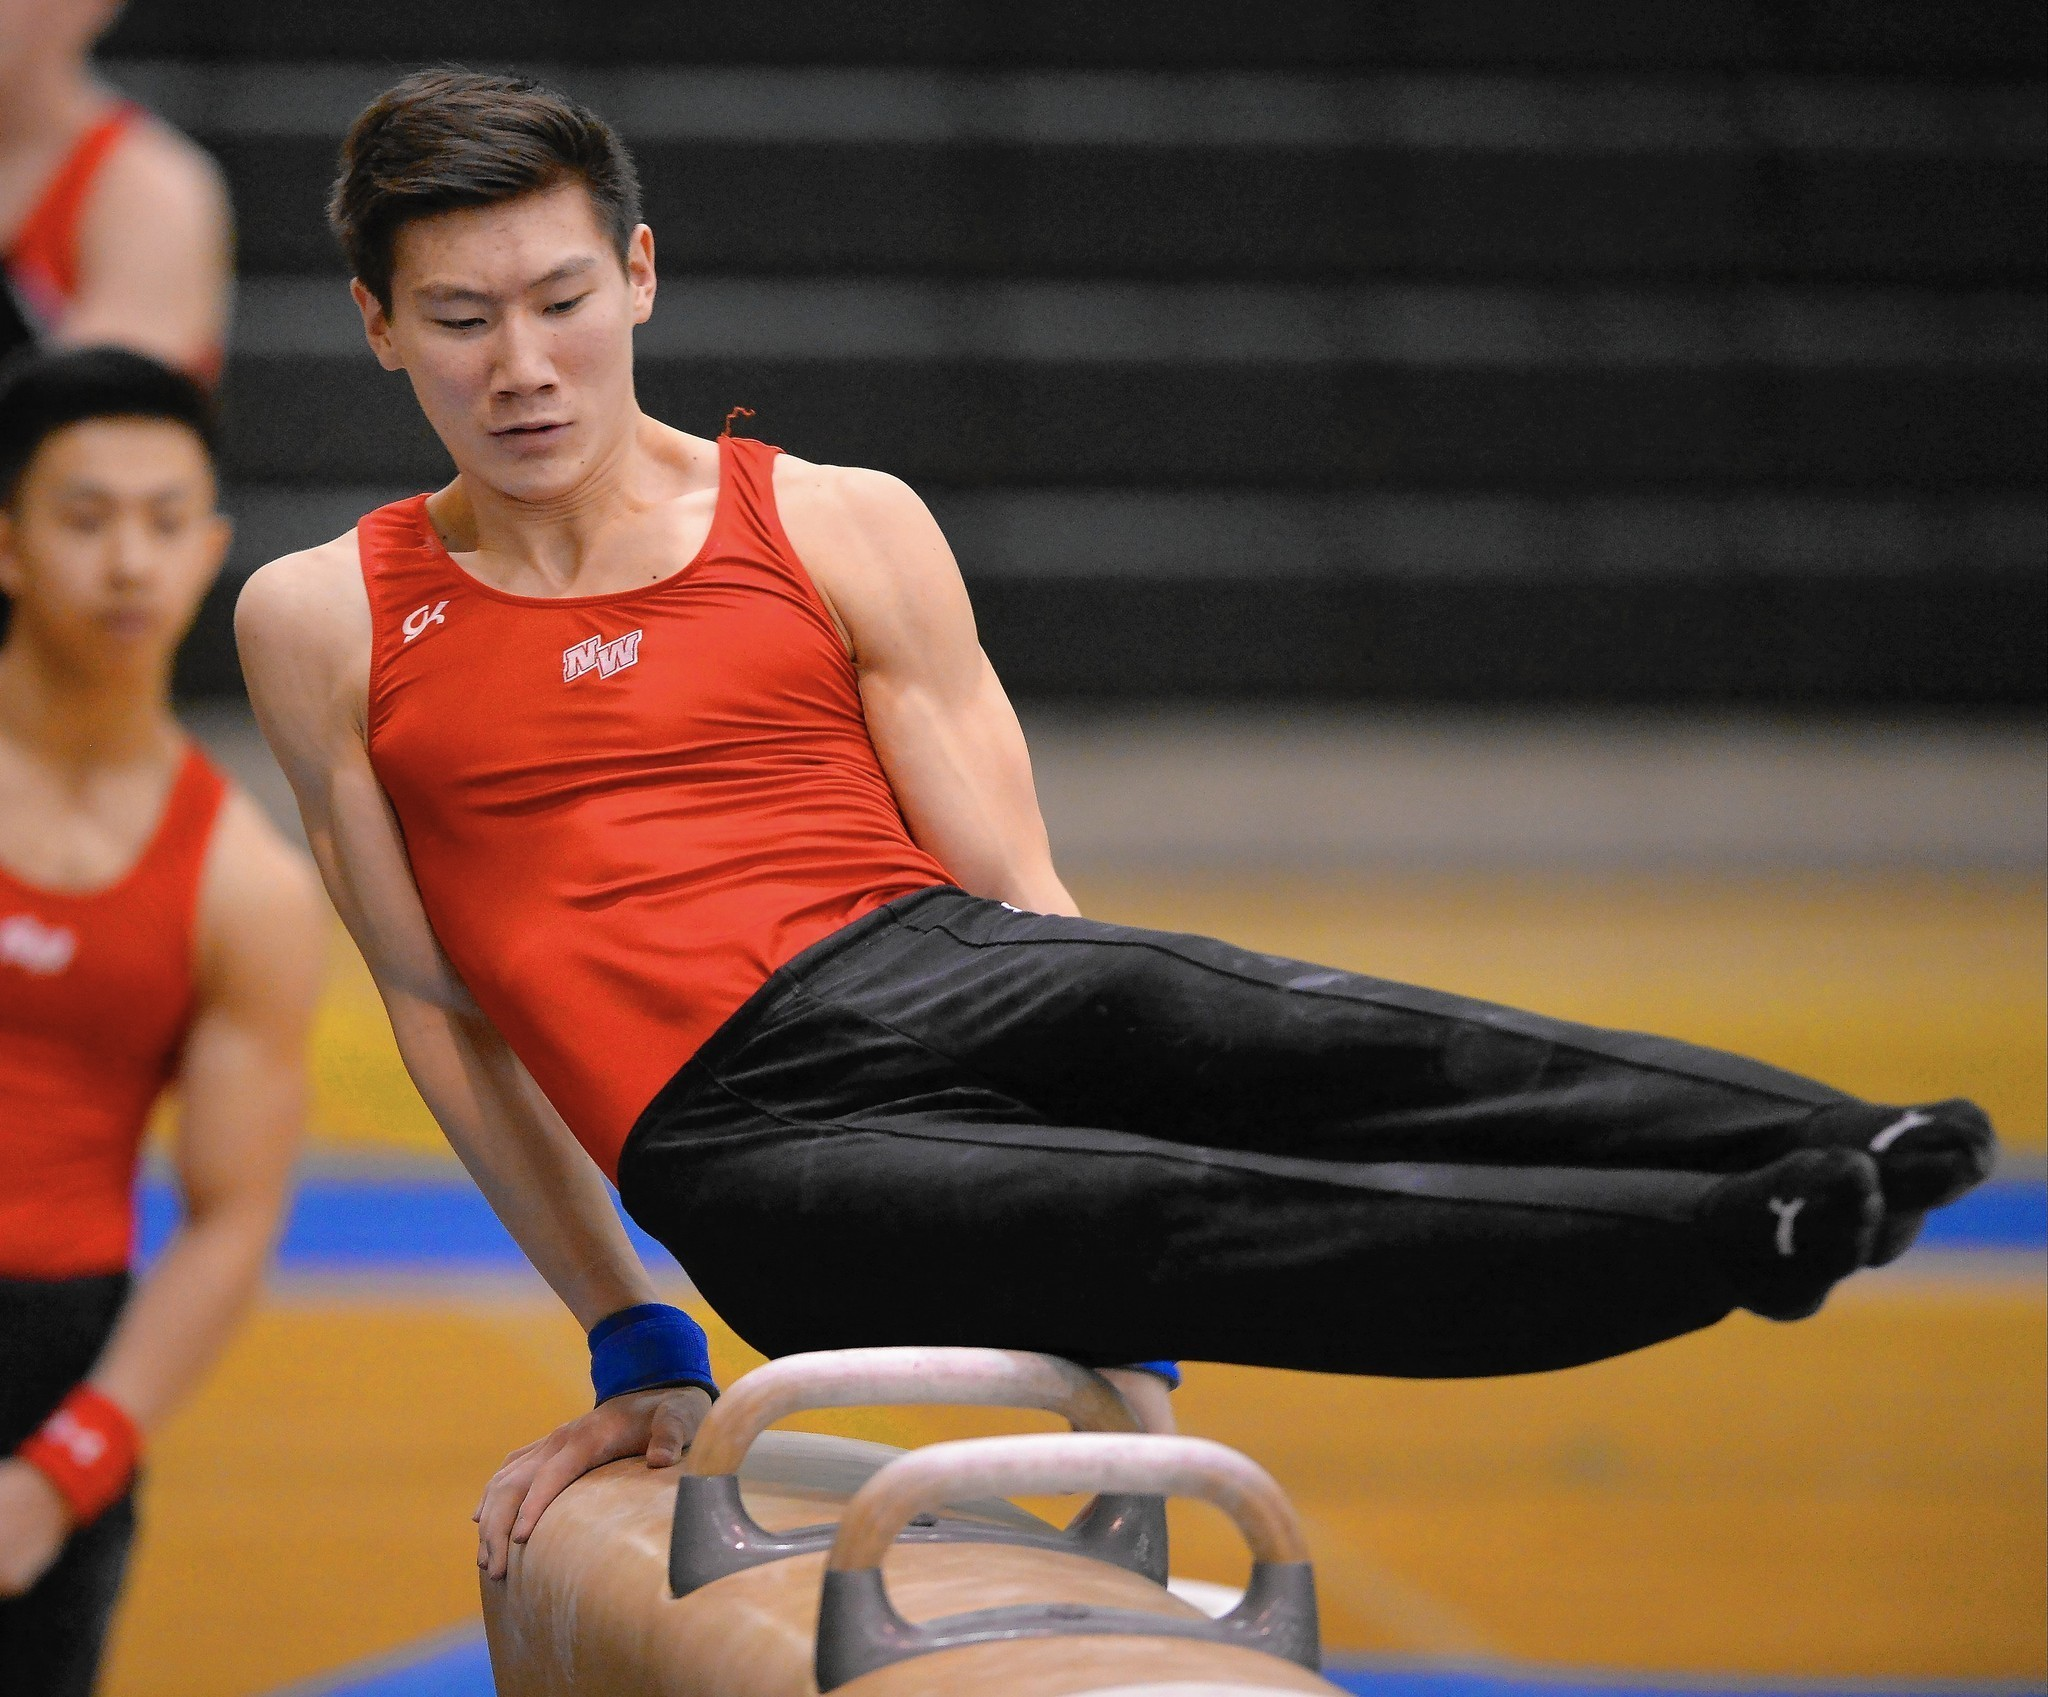 mgc westboro gymnastics meet score